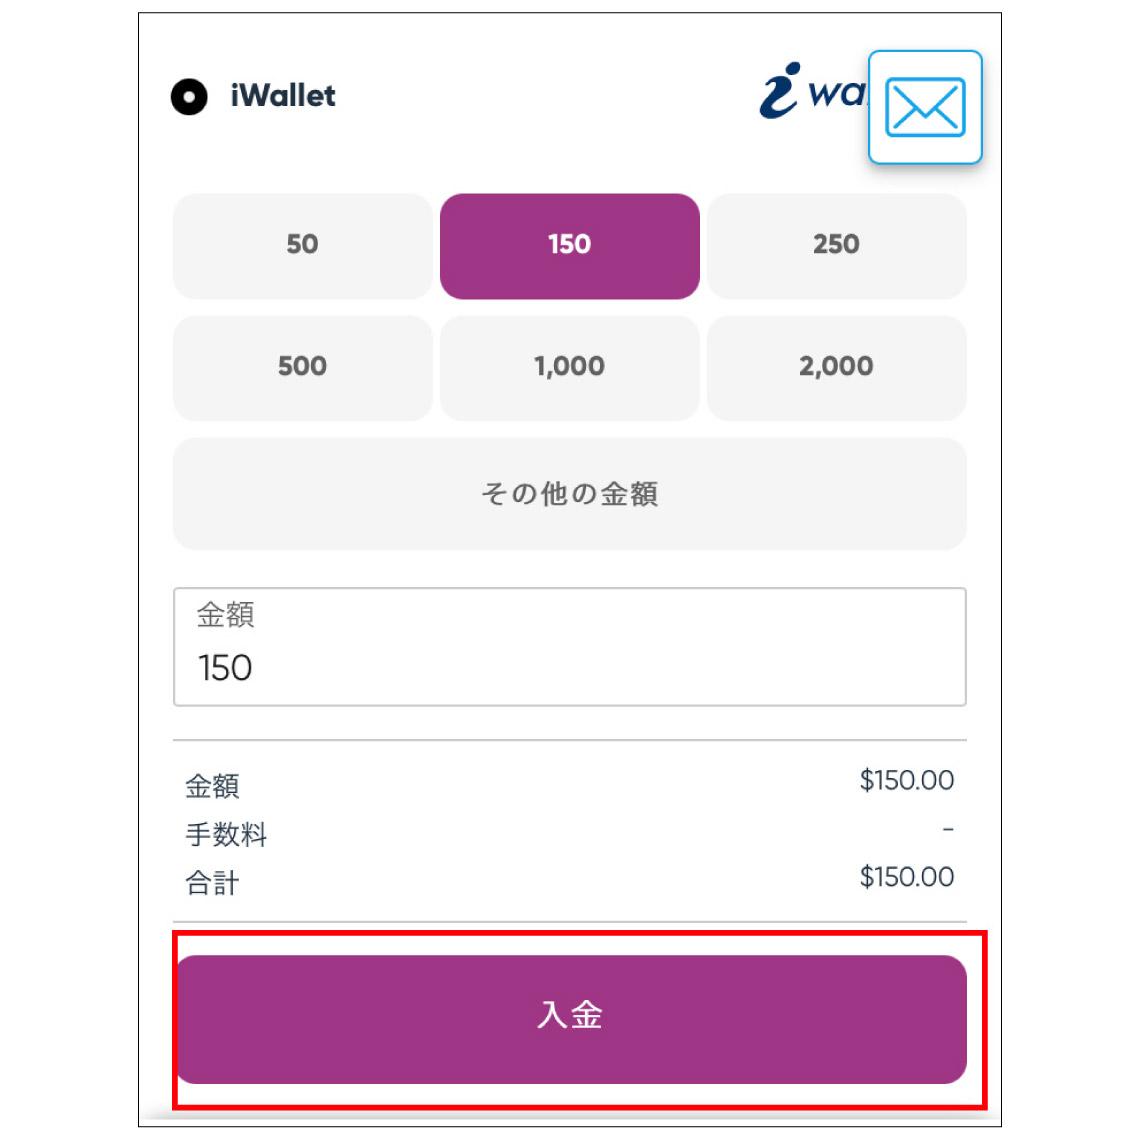 【iWallet】カジノシークレットへの入金方法